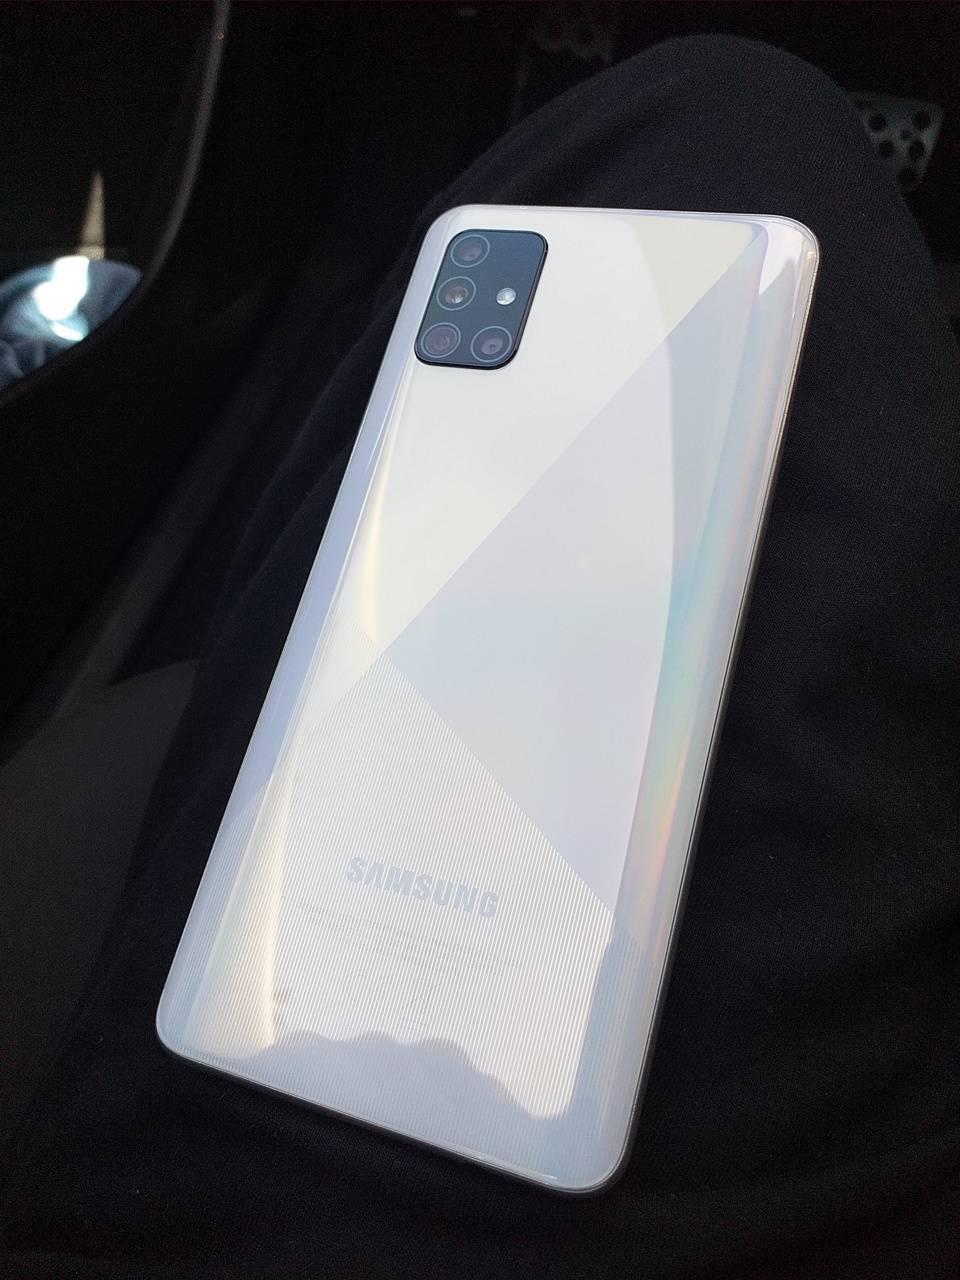 Samsung Galaxy A51 Wallpaper By Balkarserac 4f Free On Zedge